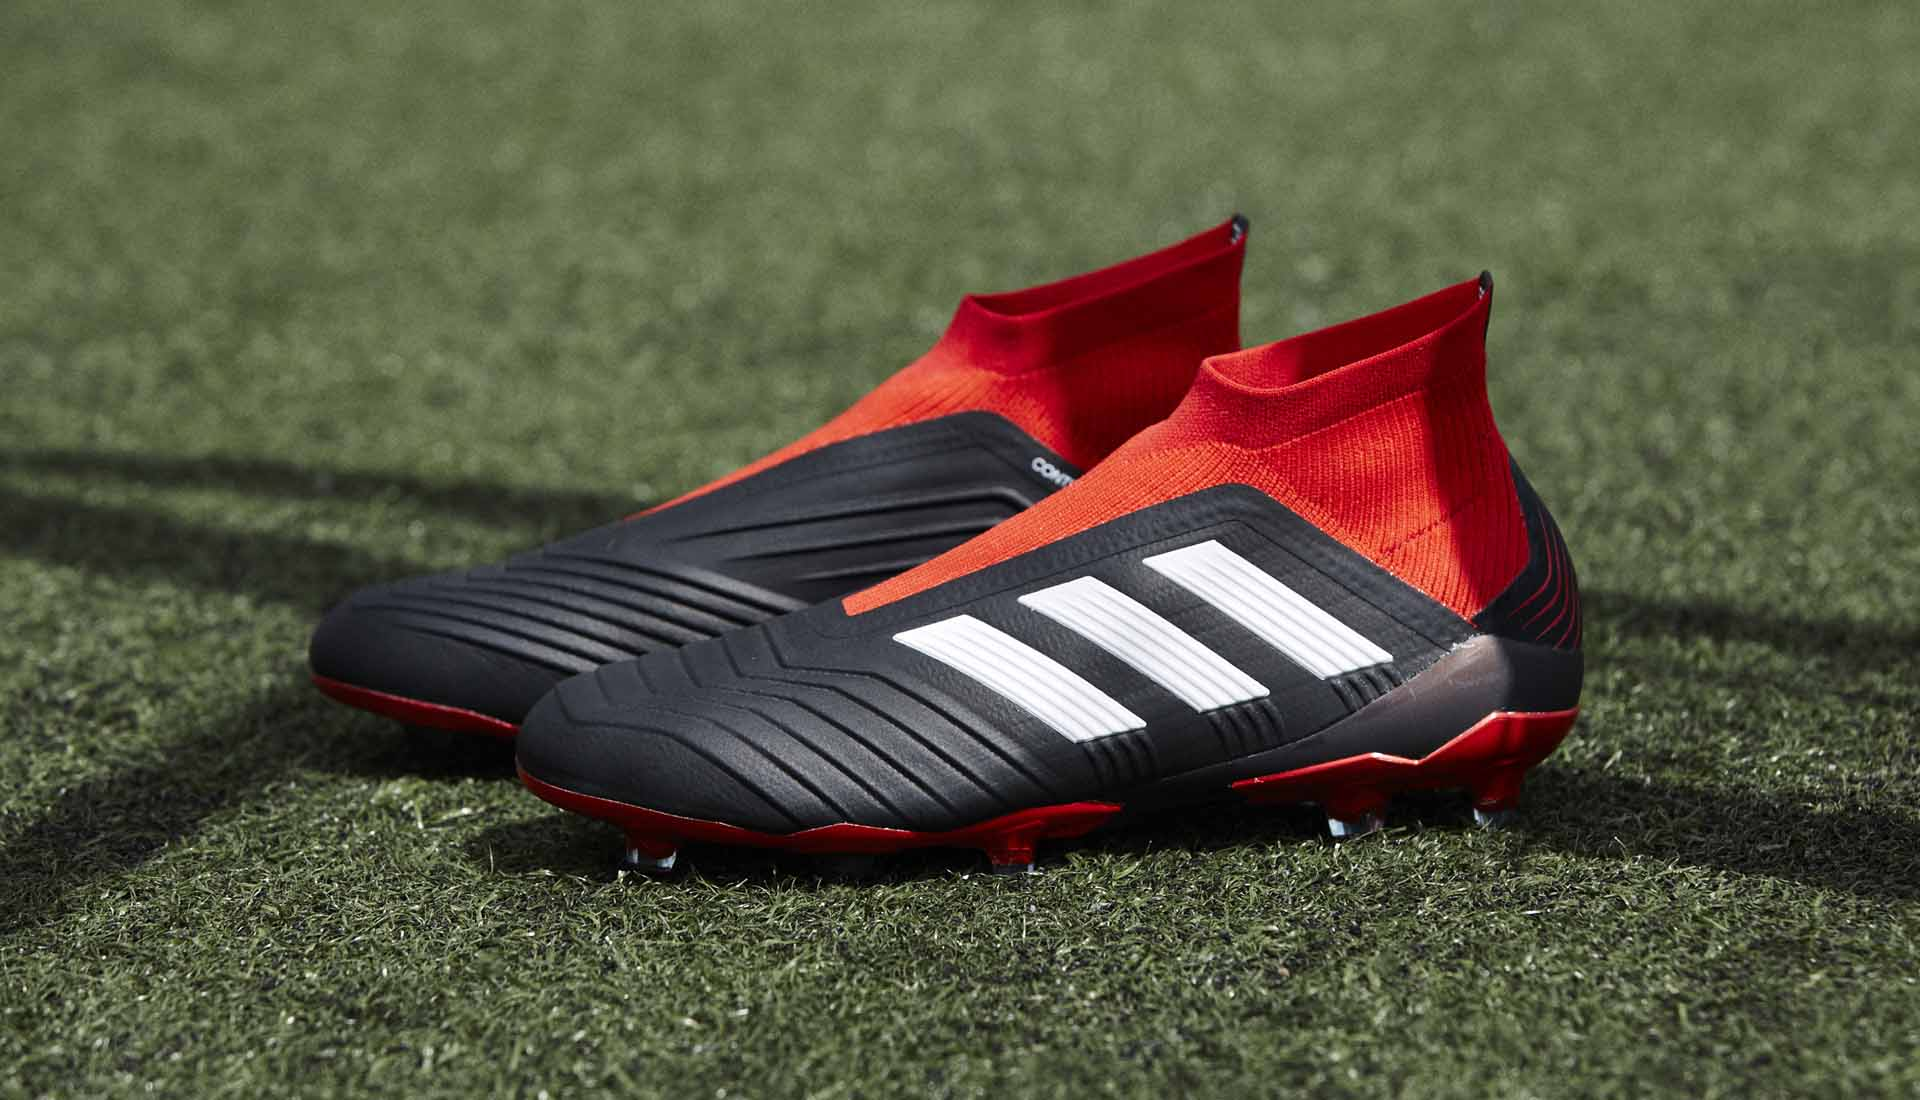 online retailer fd428 be5a8 4-adidas-predator-18-team-mode.jpg